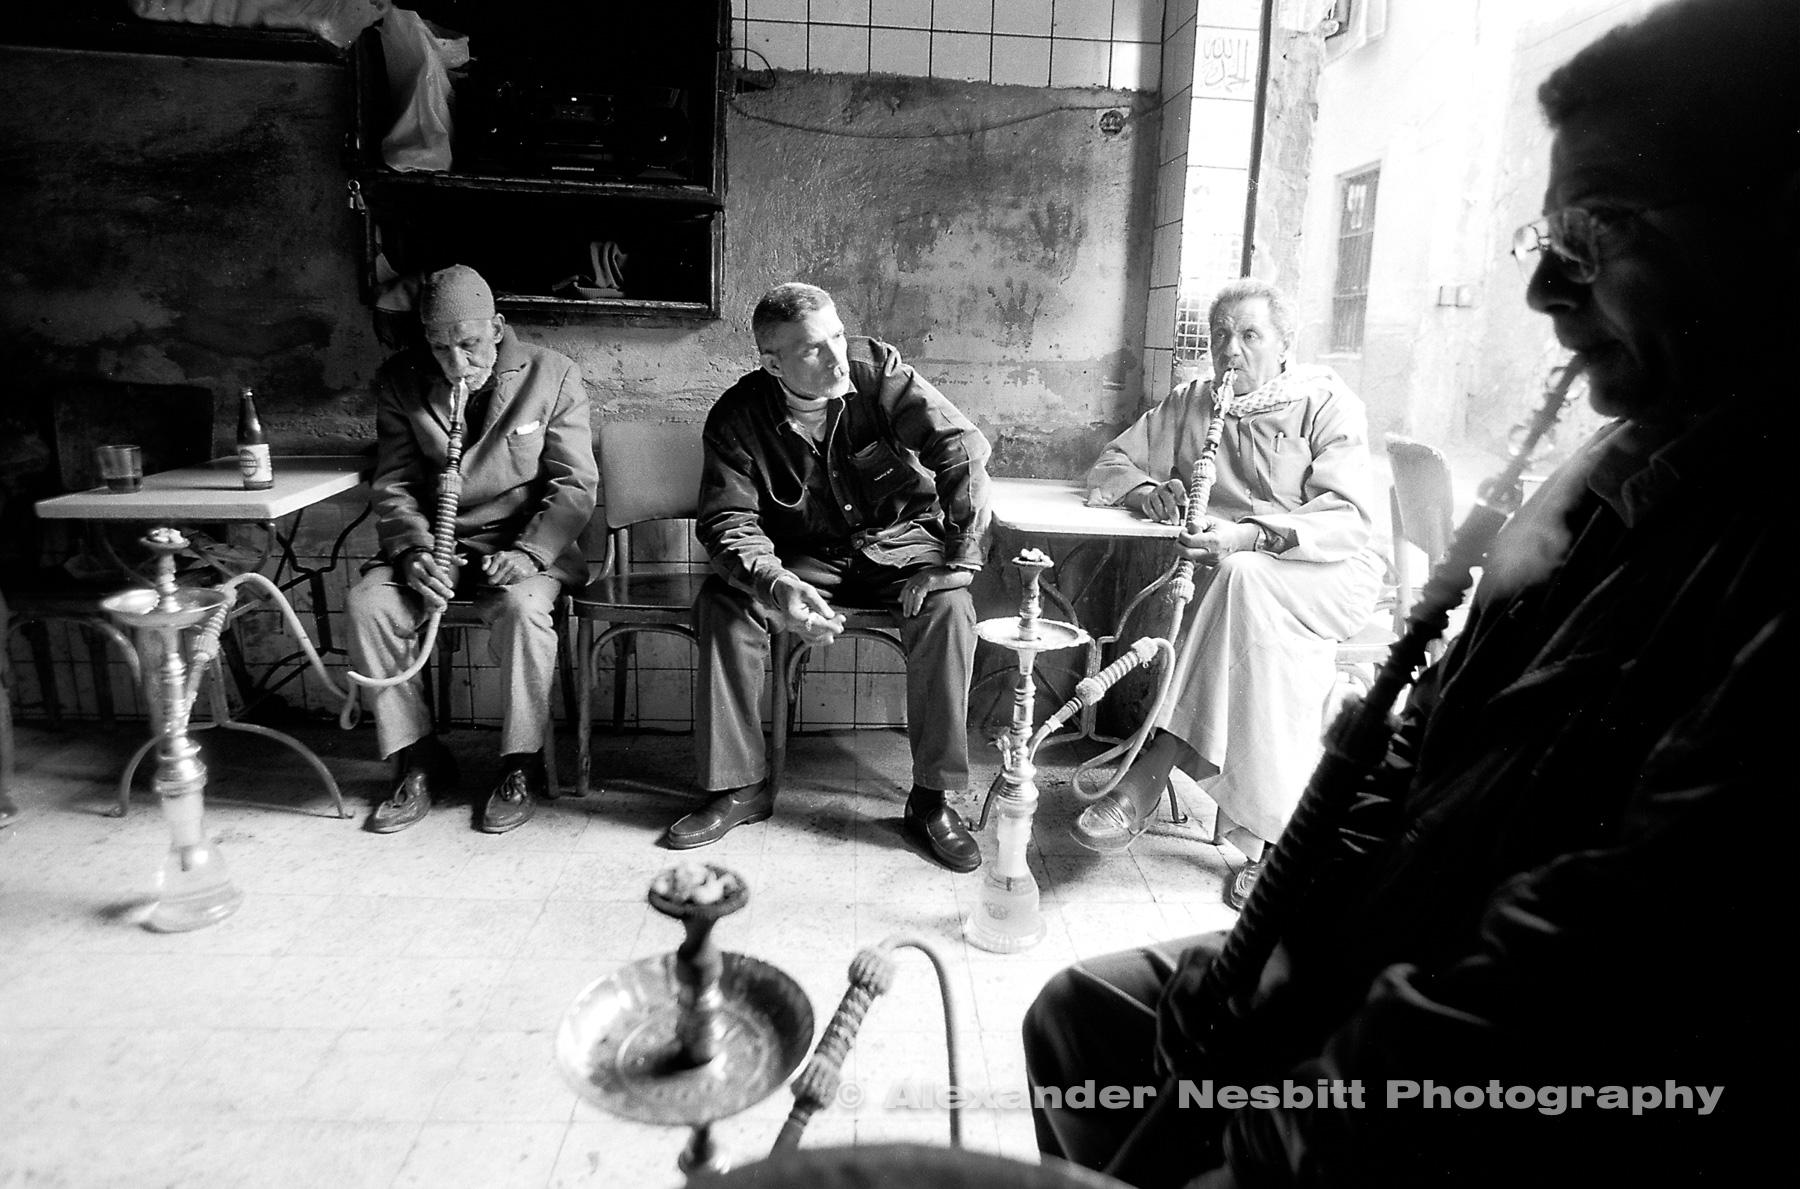 Shesha cafe, Quaitbay, City of the Dead, Cairo.